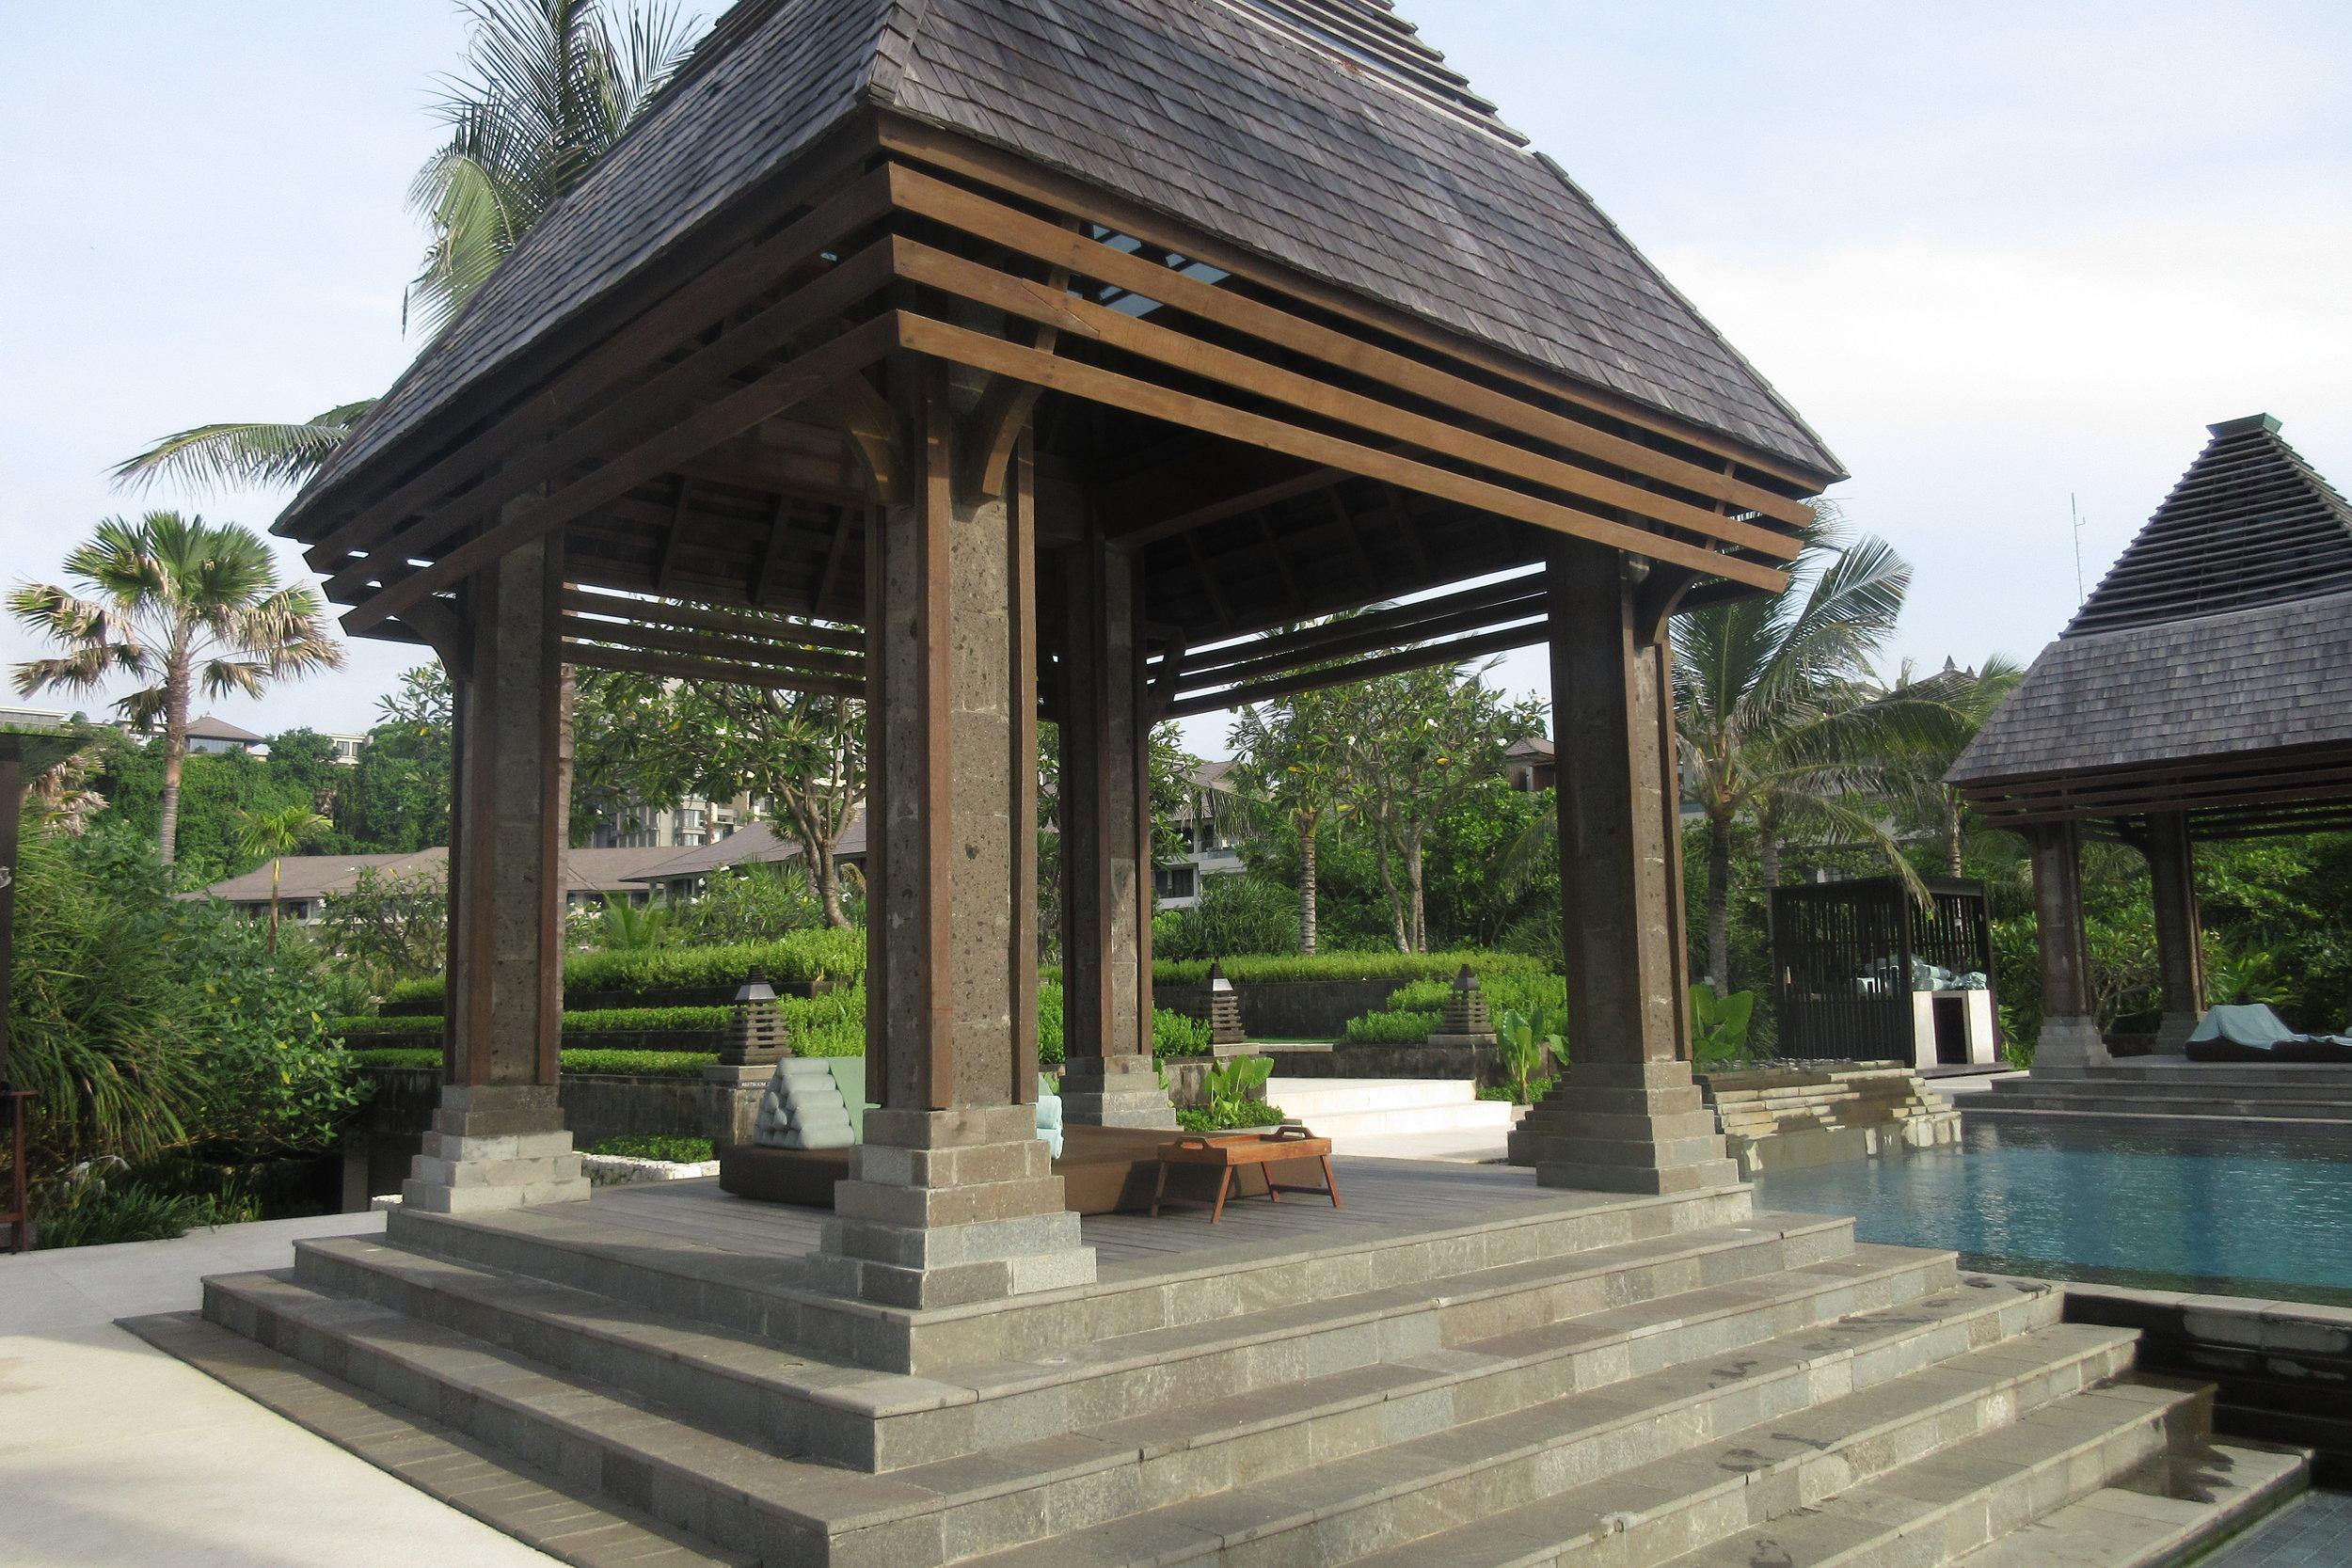 The Ritz-Carlton, Bali – Poolside cabanas